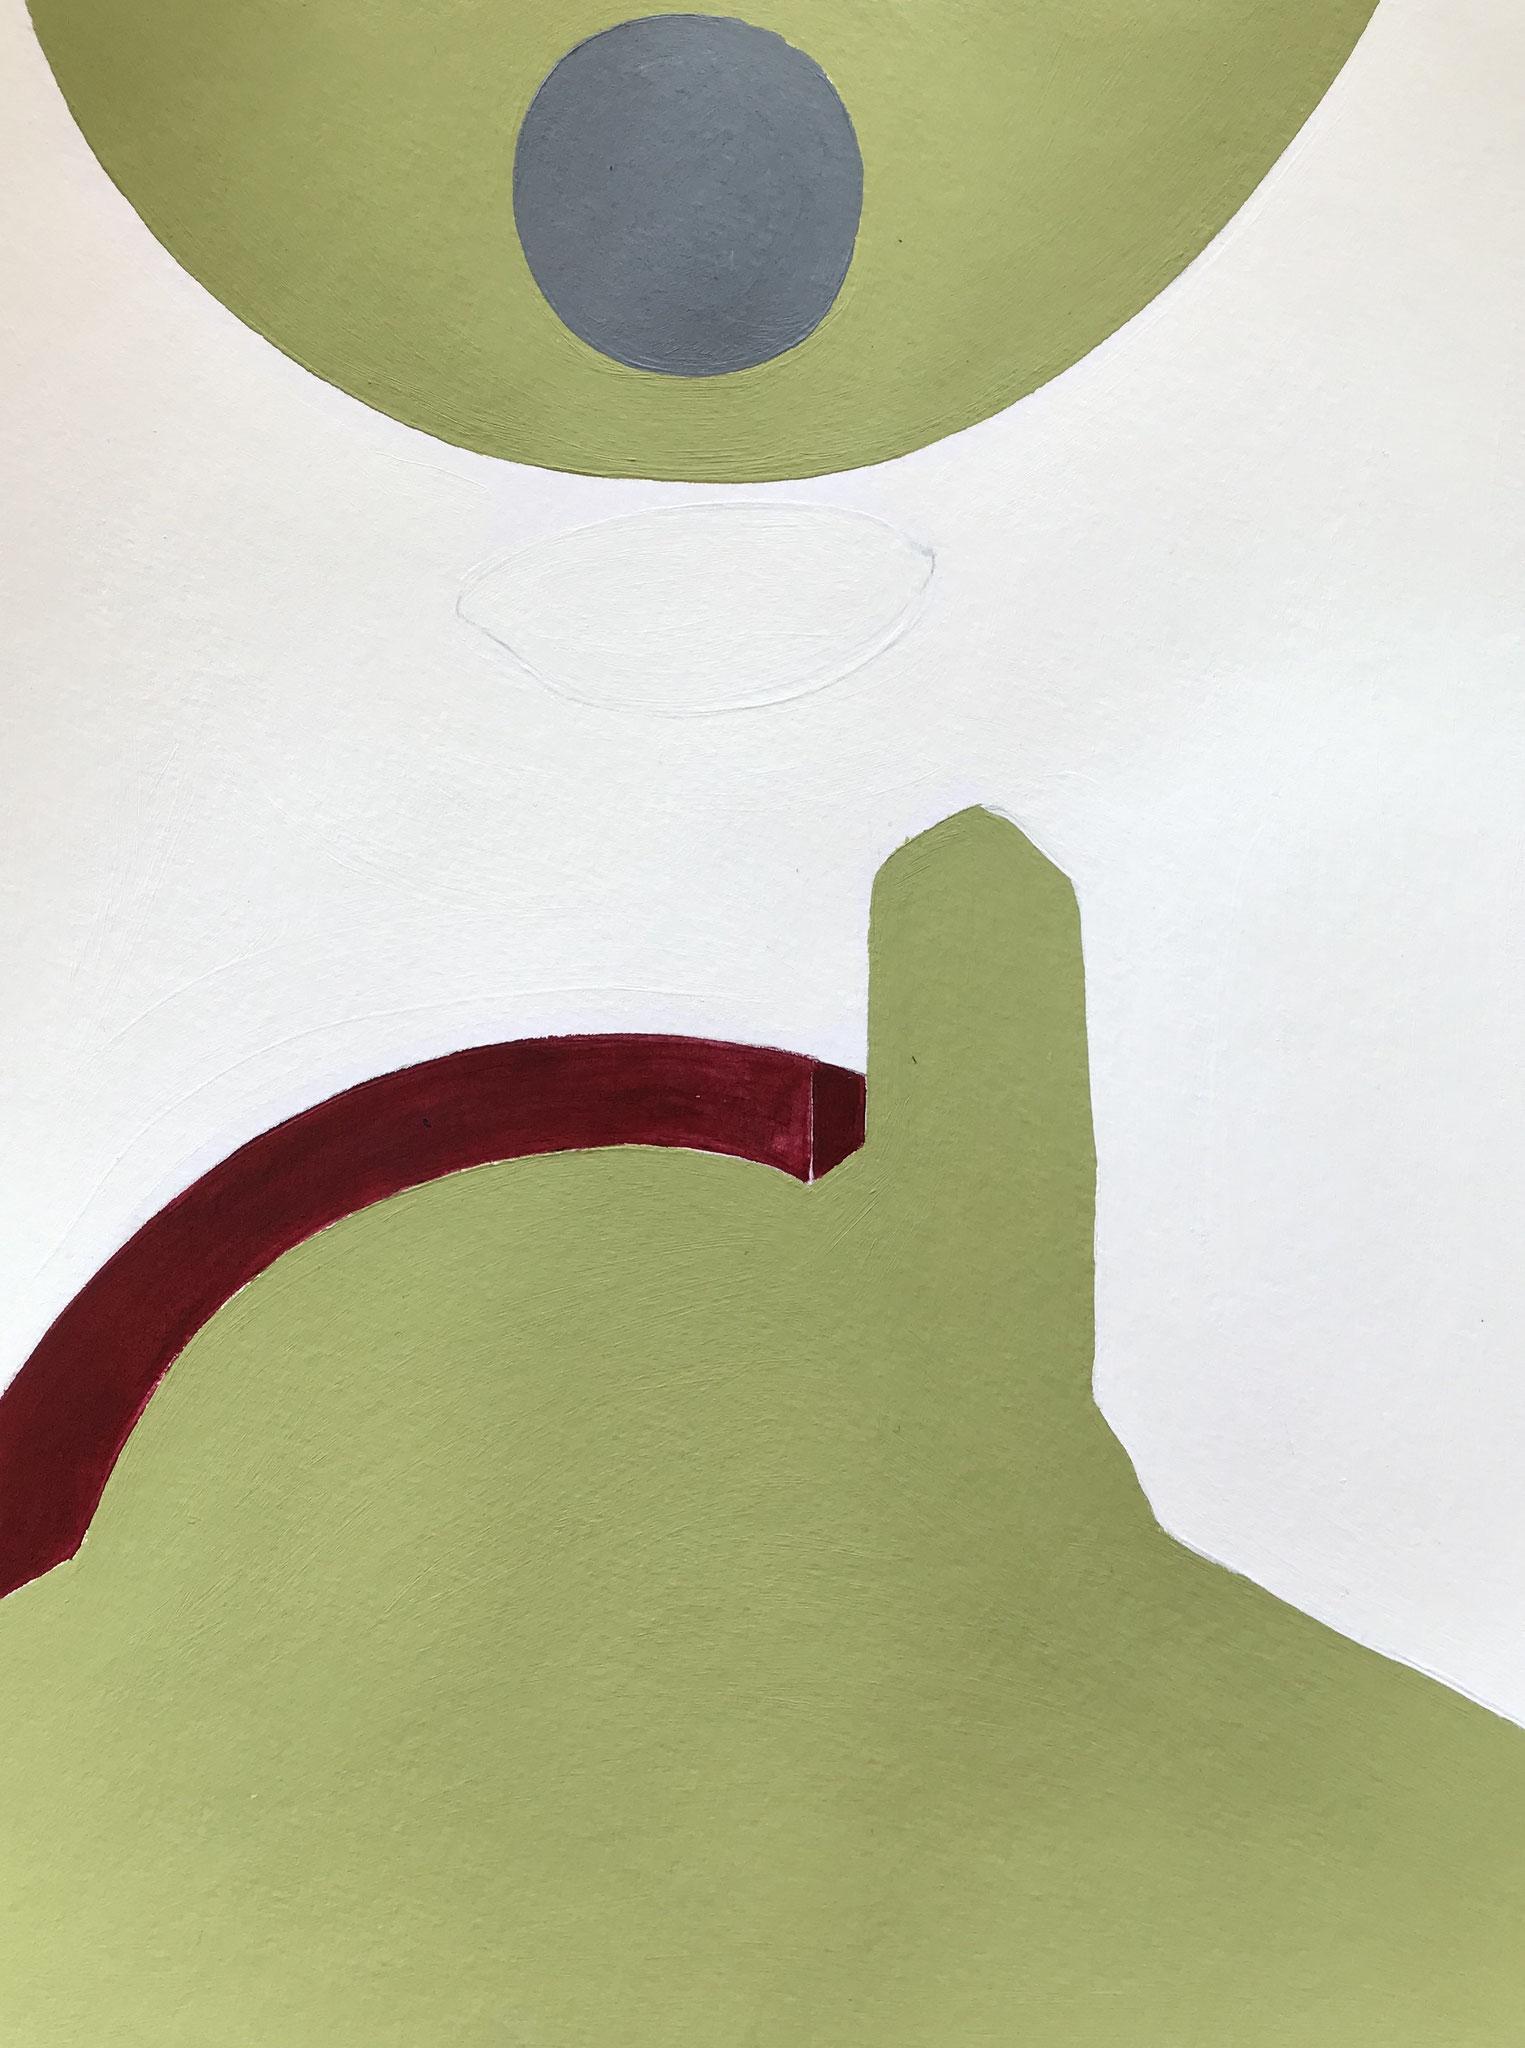 Turrell/ Piz Uter, Acryl auf Papier, 29 x 21cm, 2019